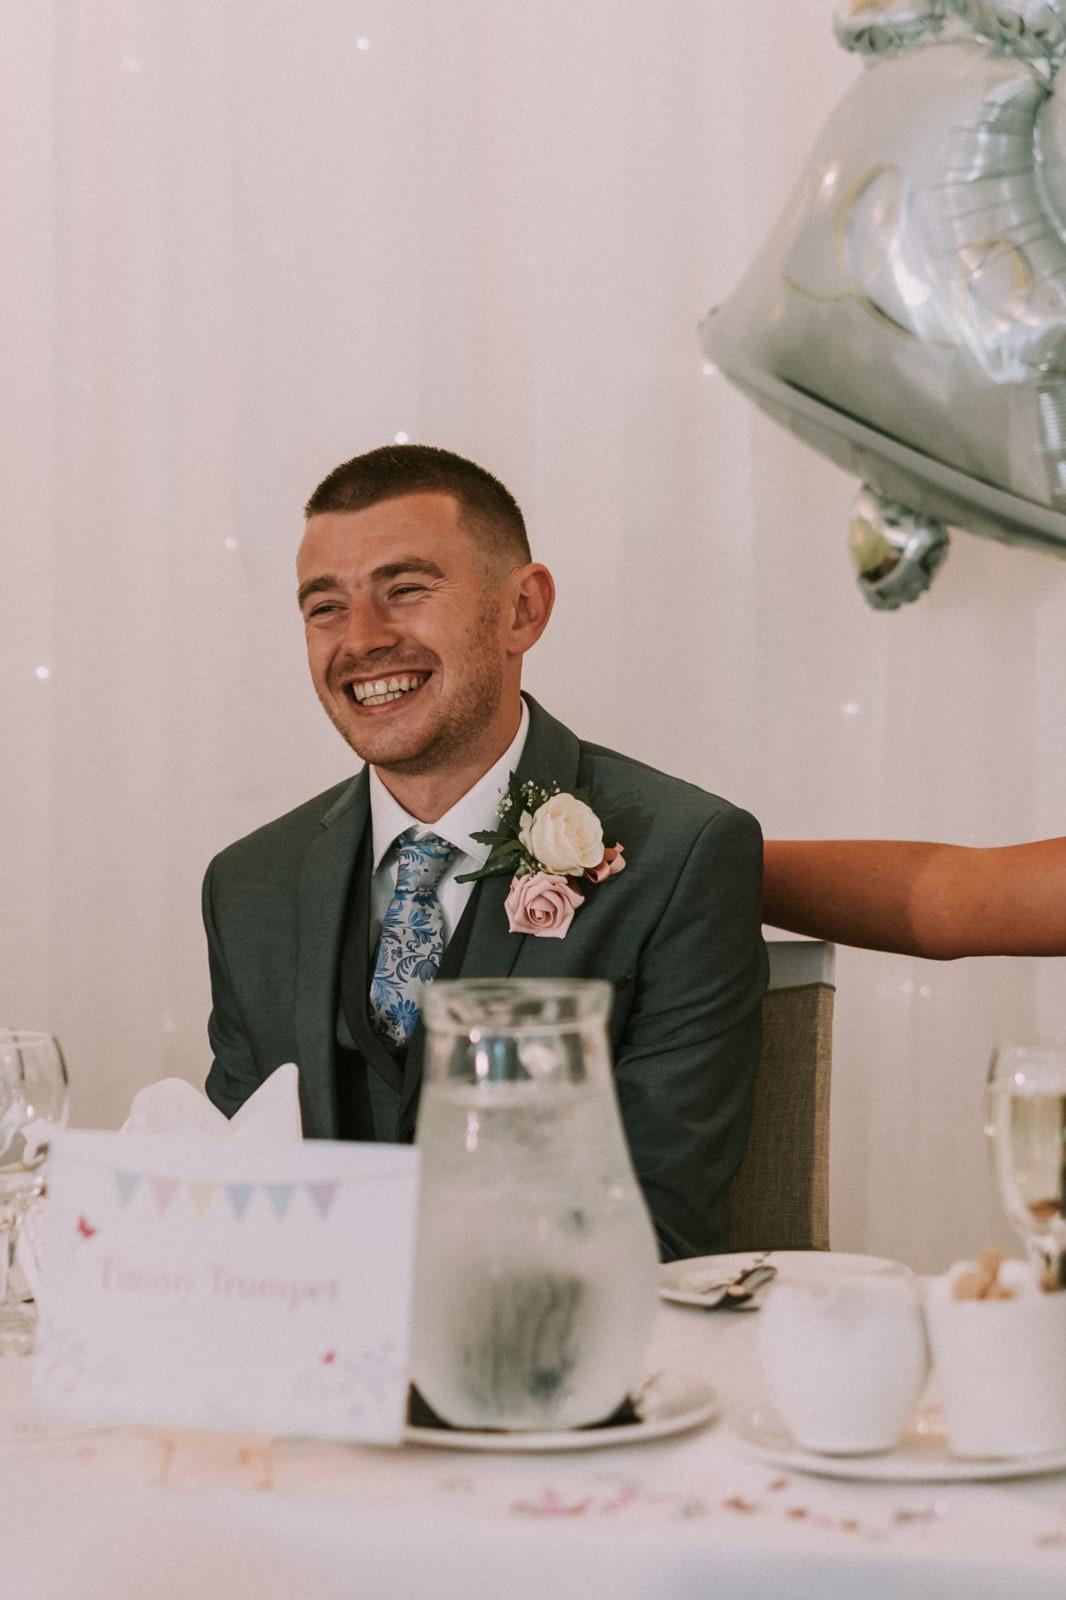 Dalmeny-Park-Glasgow-Wedding-Dearly-Photography-Scotland (62 of 75).jpg